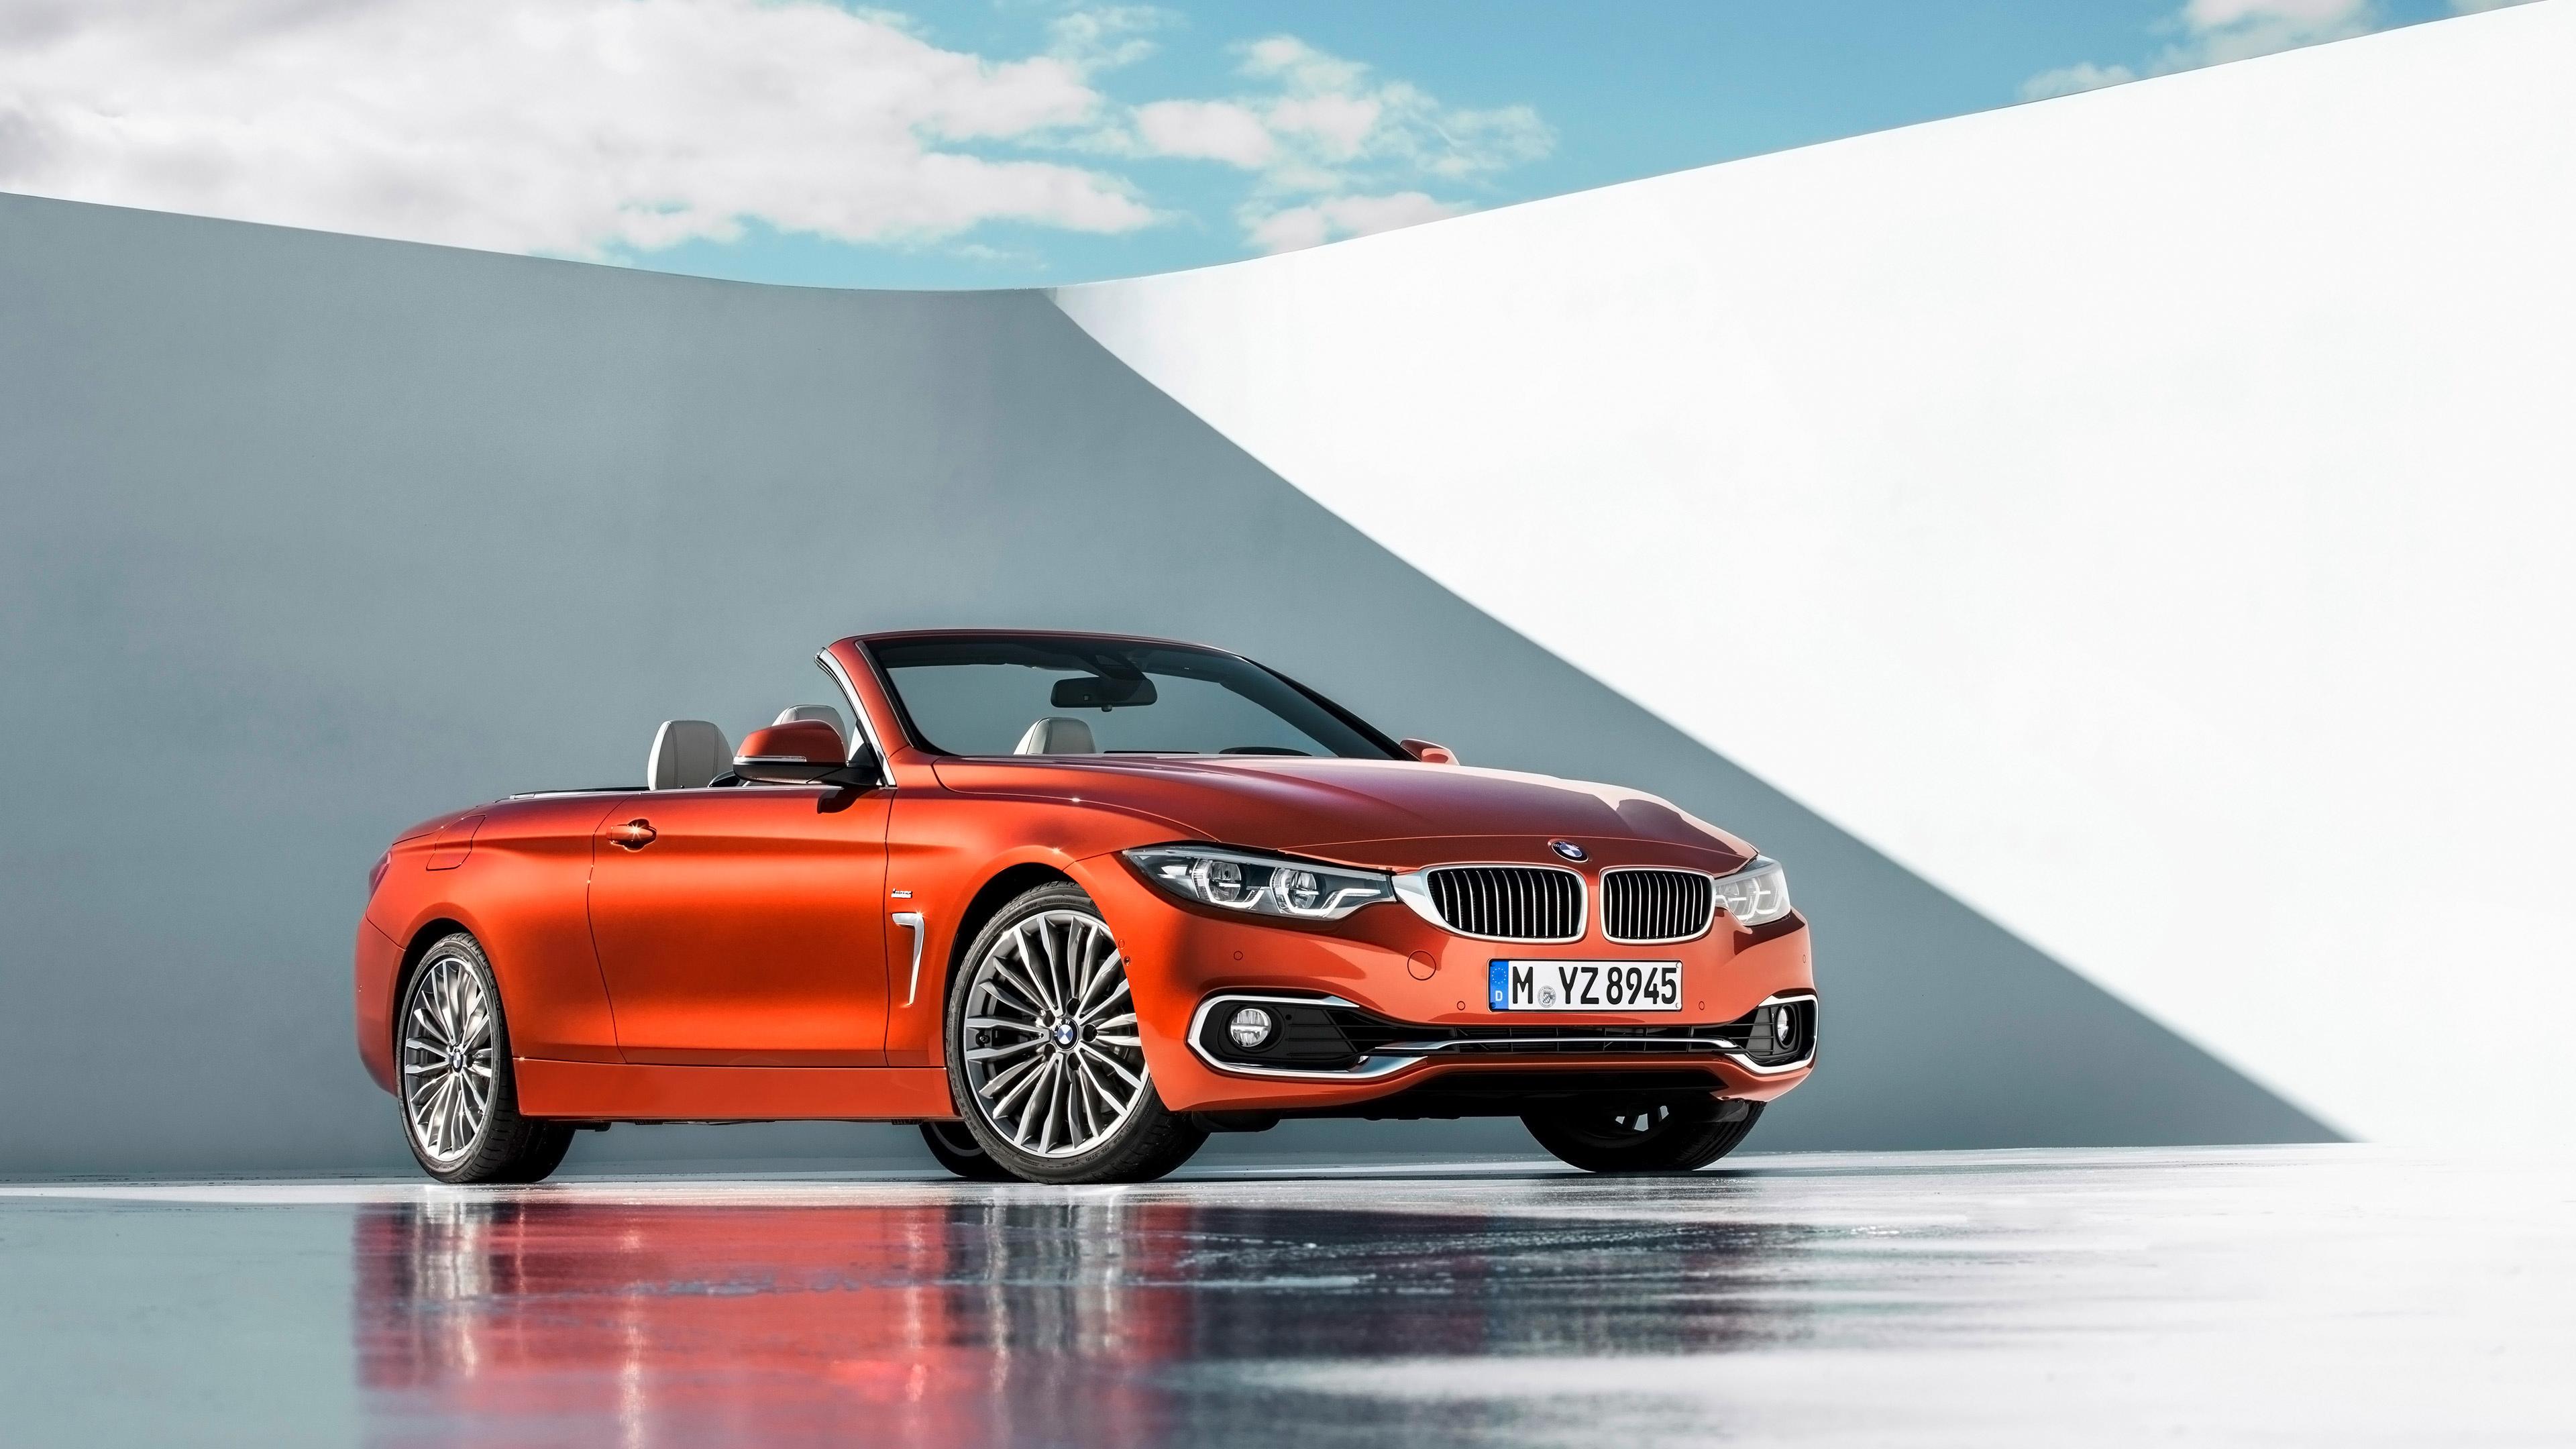 2018 Bmw 4 Series Luxury Convertible 4k Wallpaper Hd Car